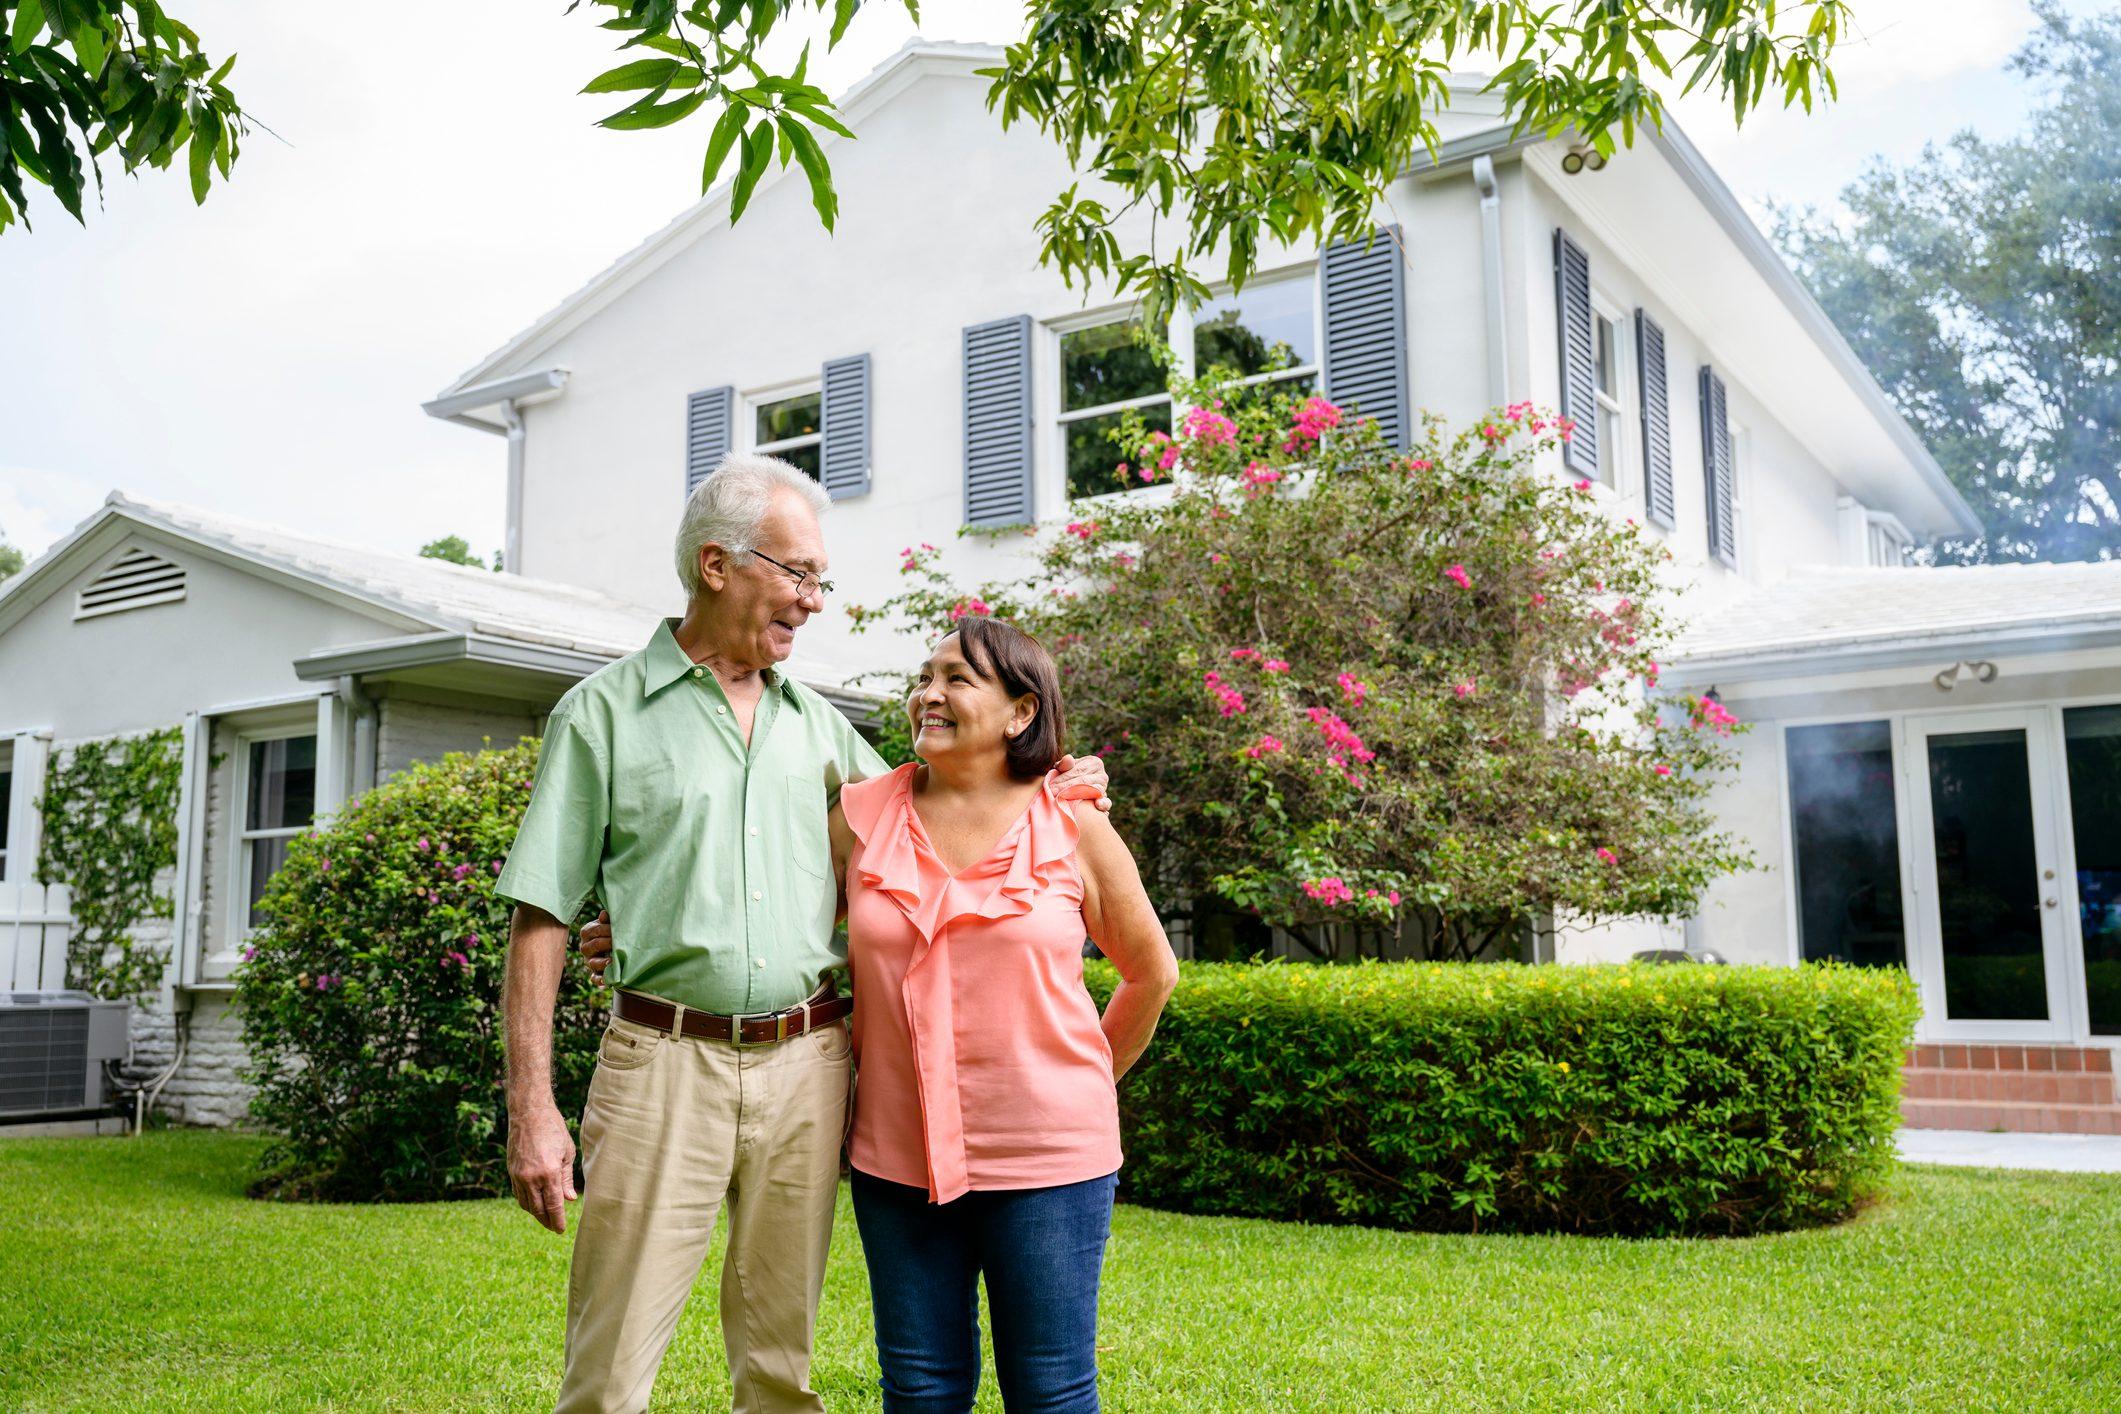 Embracing Latin American seniors in backyard of Miami home